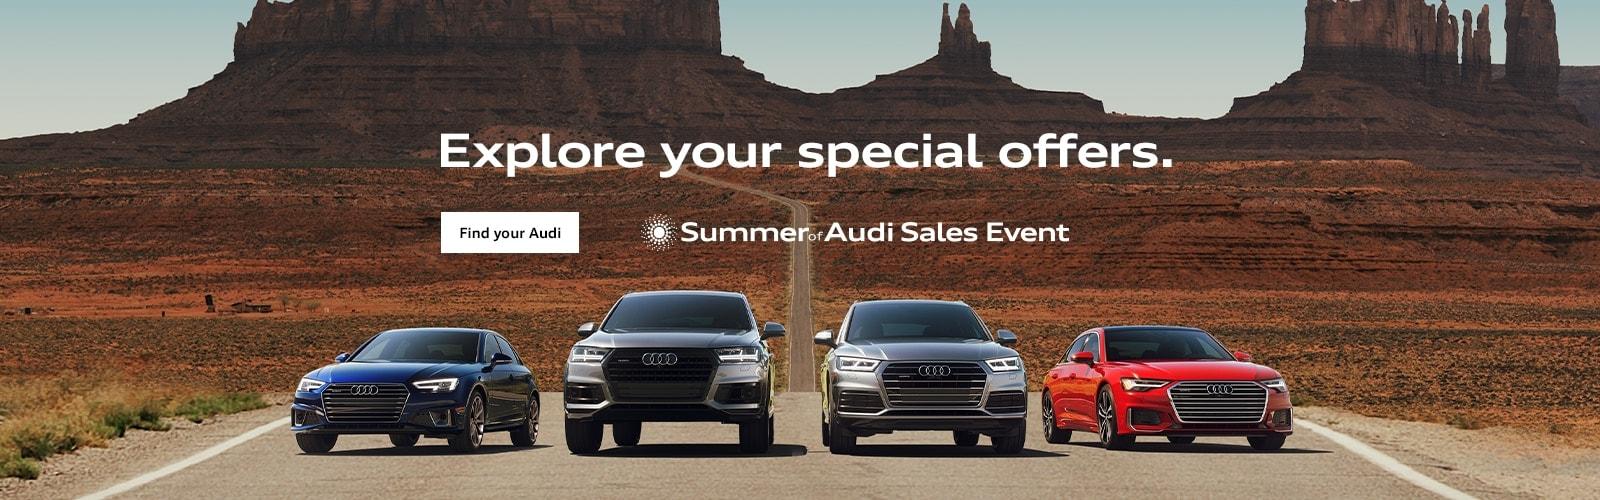 Audi Spokane   Audi Dealership in Spokane Valley, WA